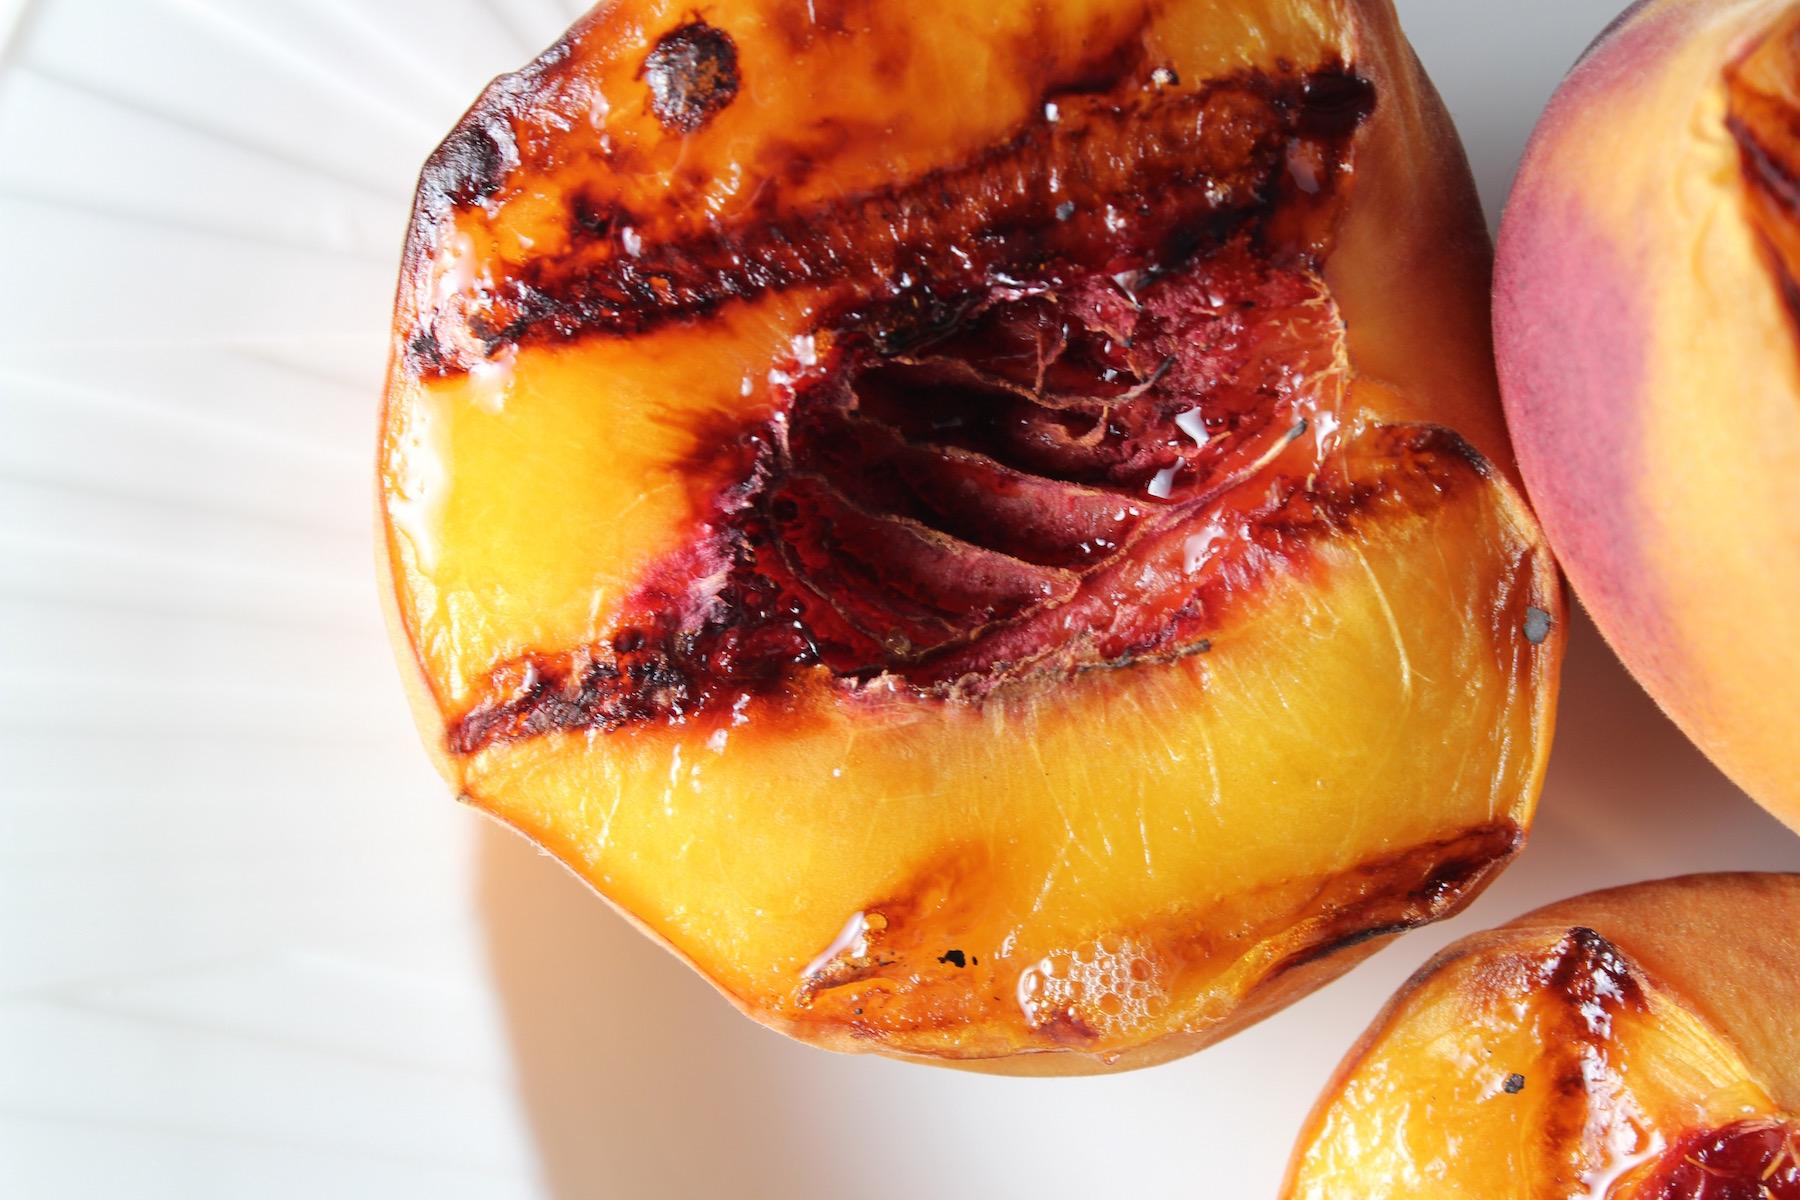 grilled peach no ice cream